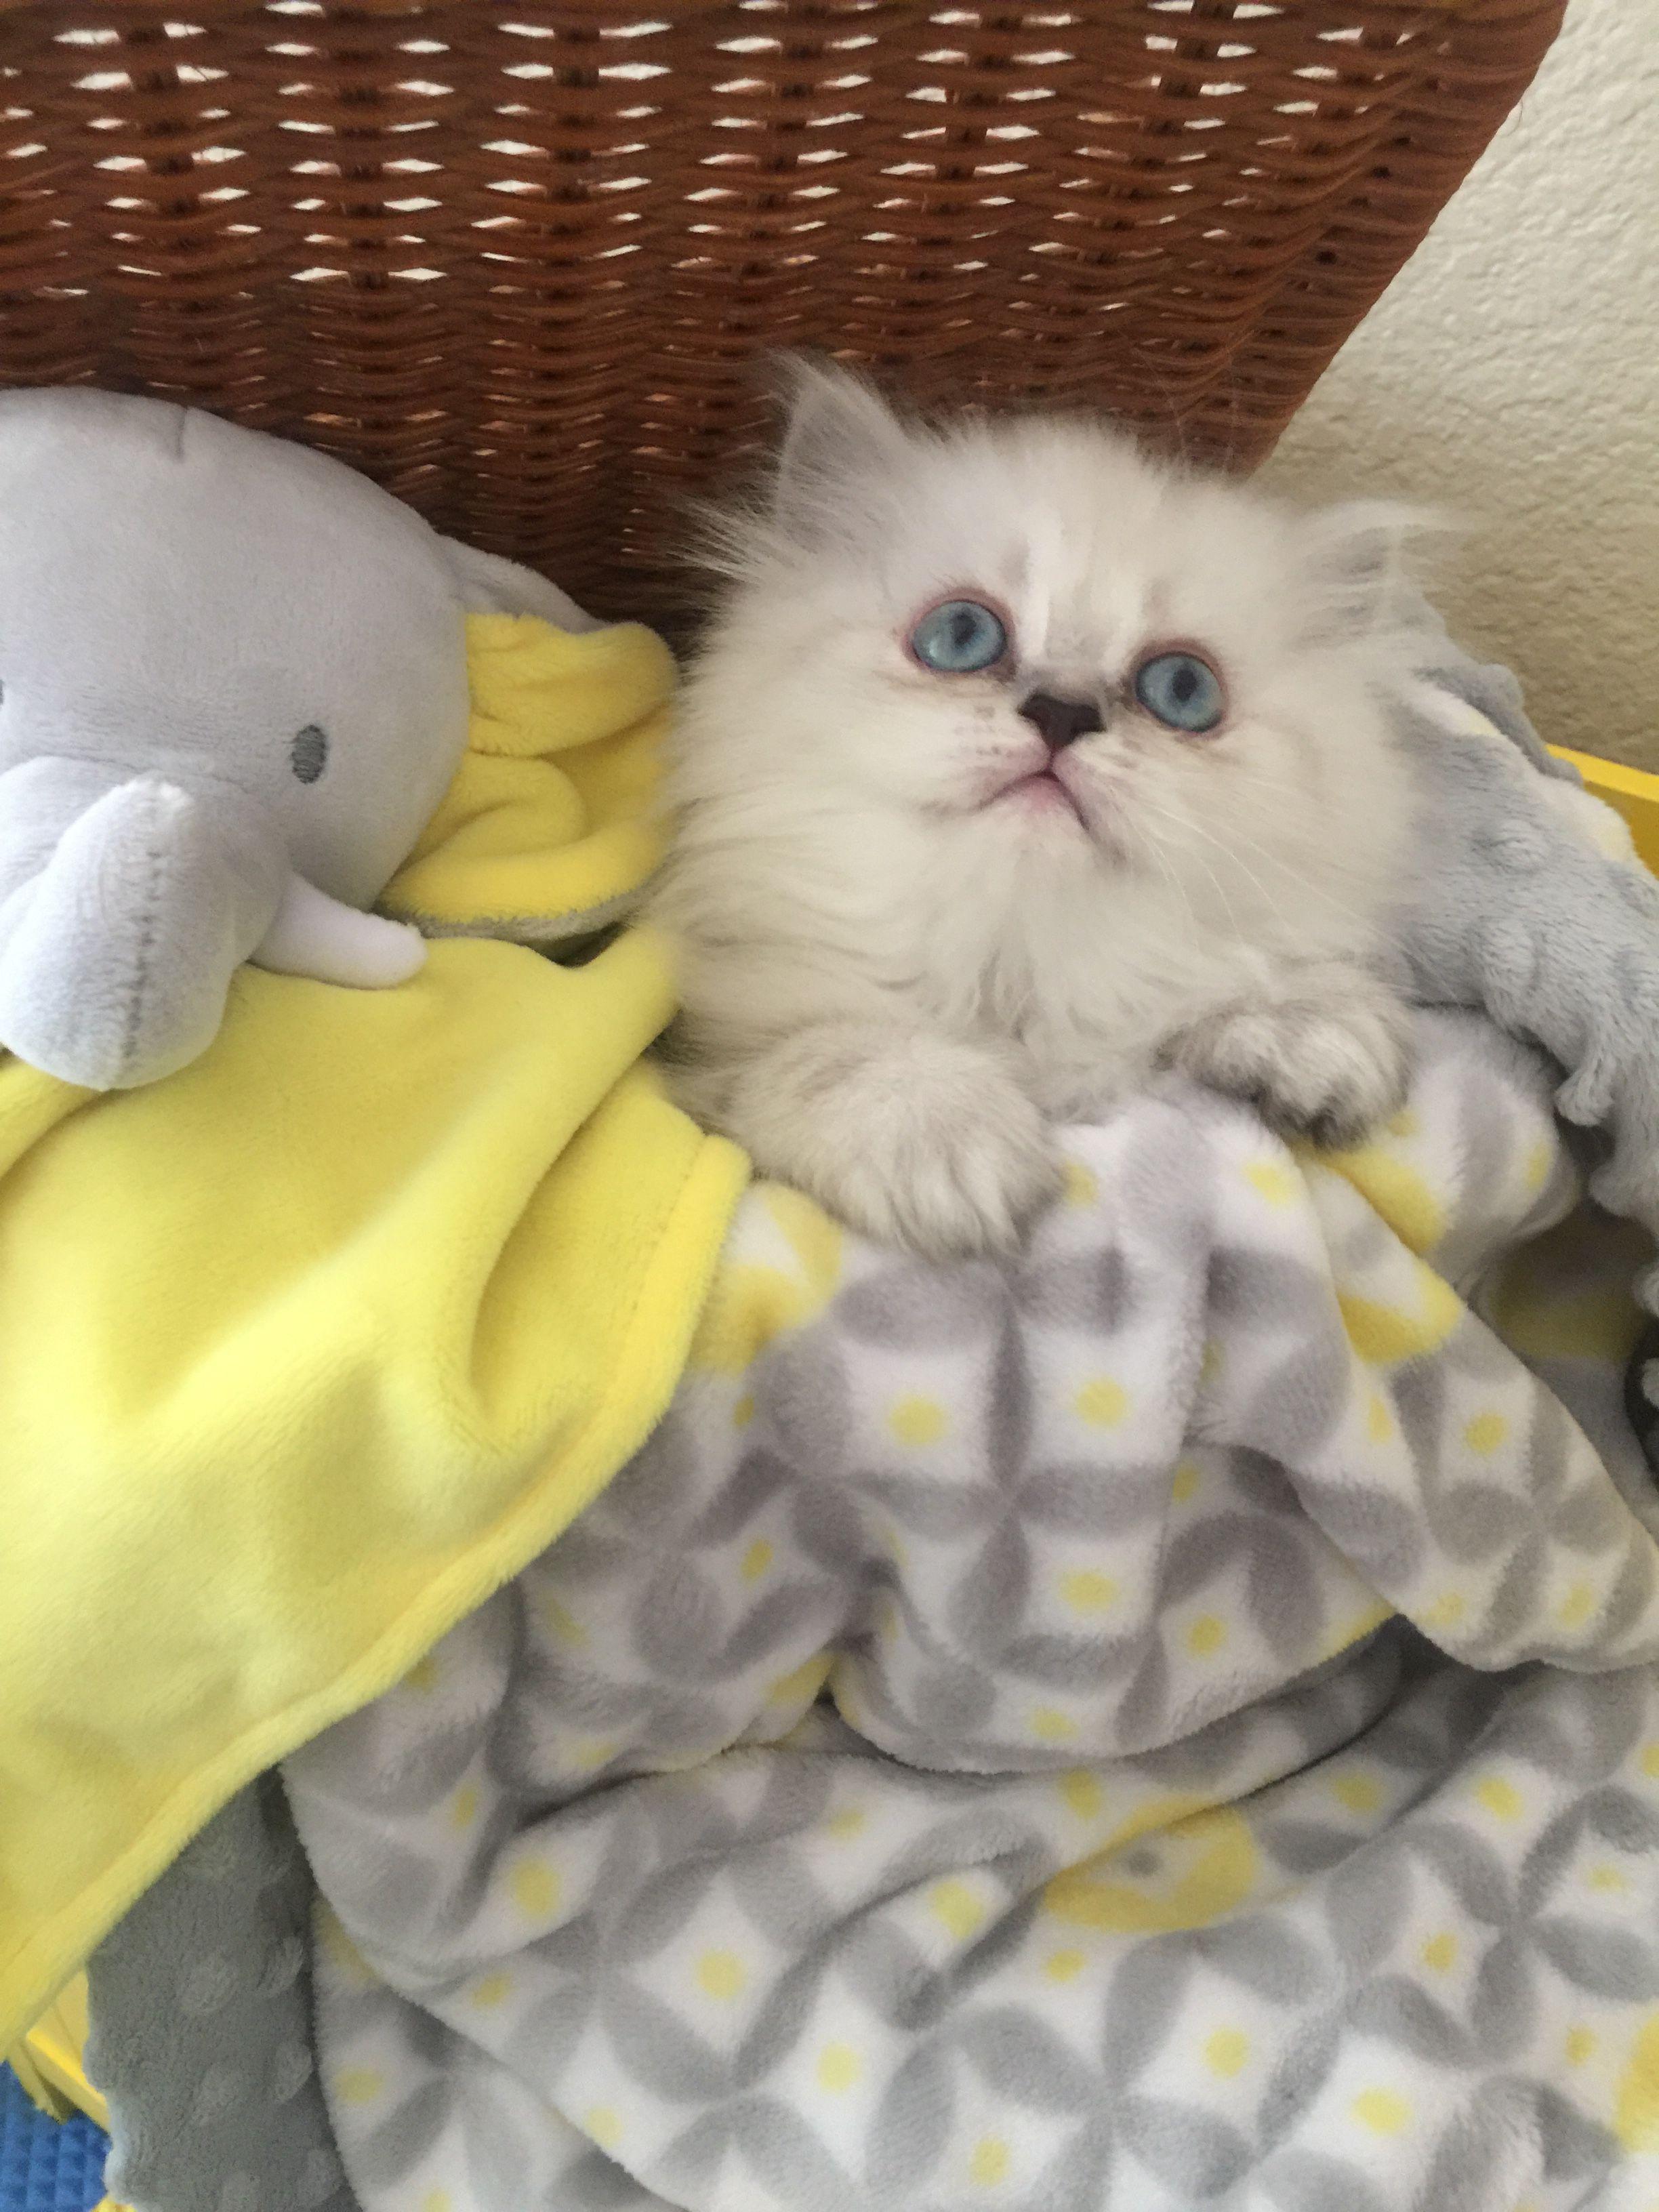 Blue Lynx Point Himilayan Persian Kitten Persian Kittens For Sale Persian Kittens Kittens